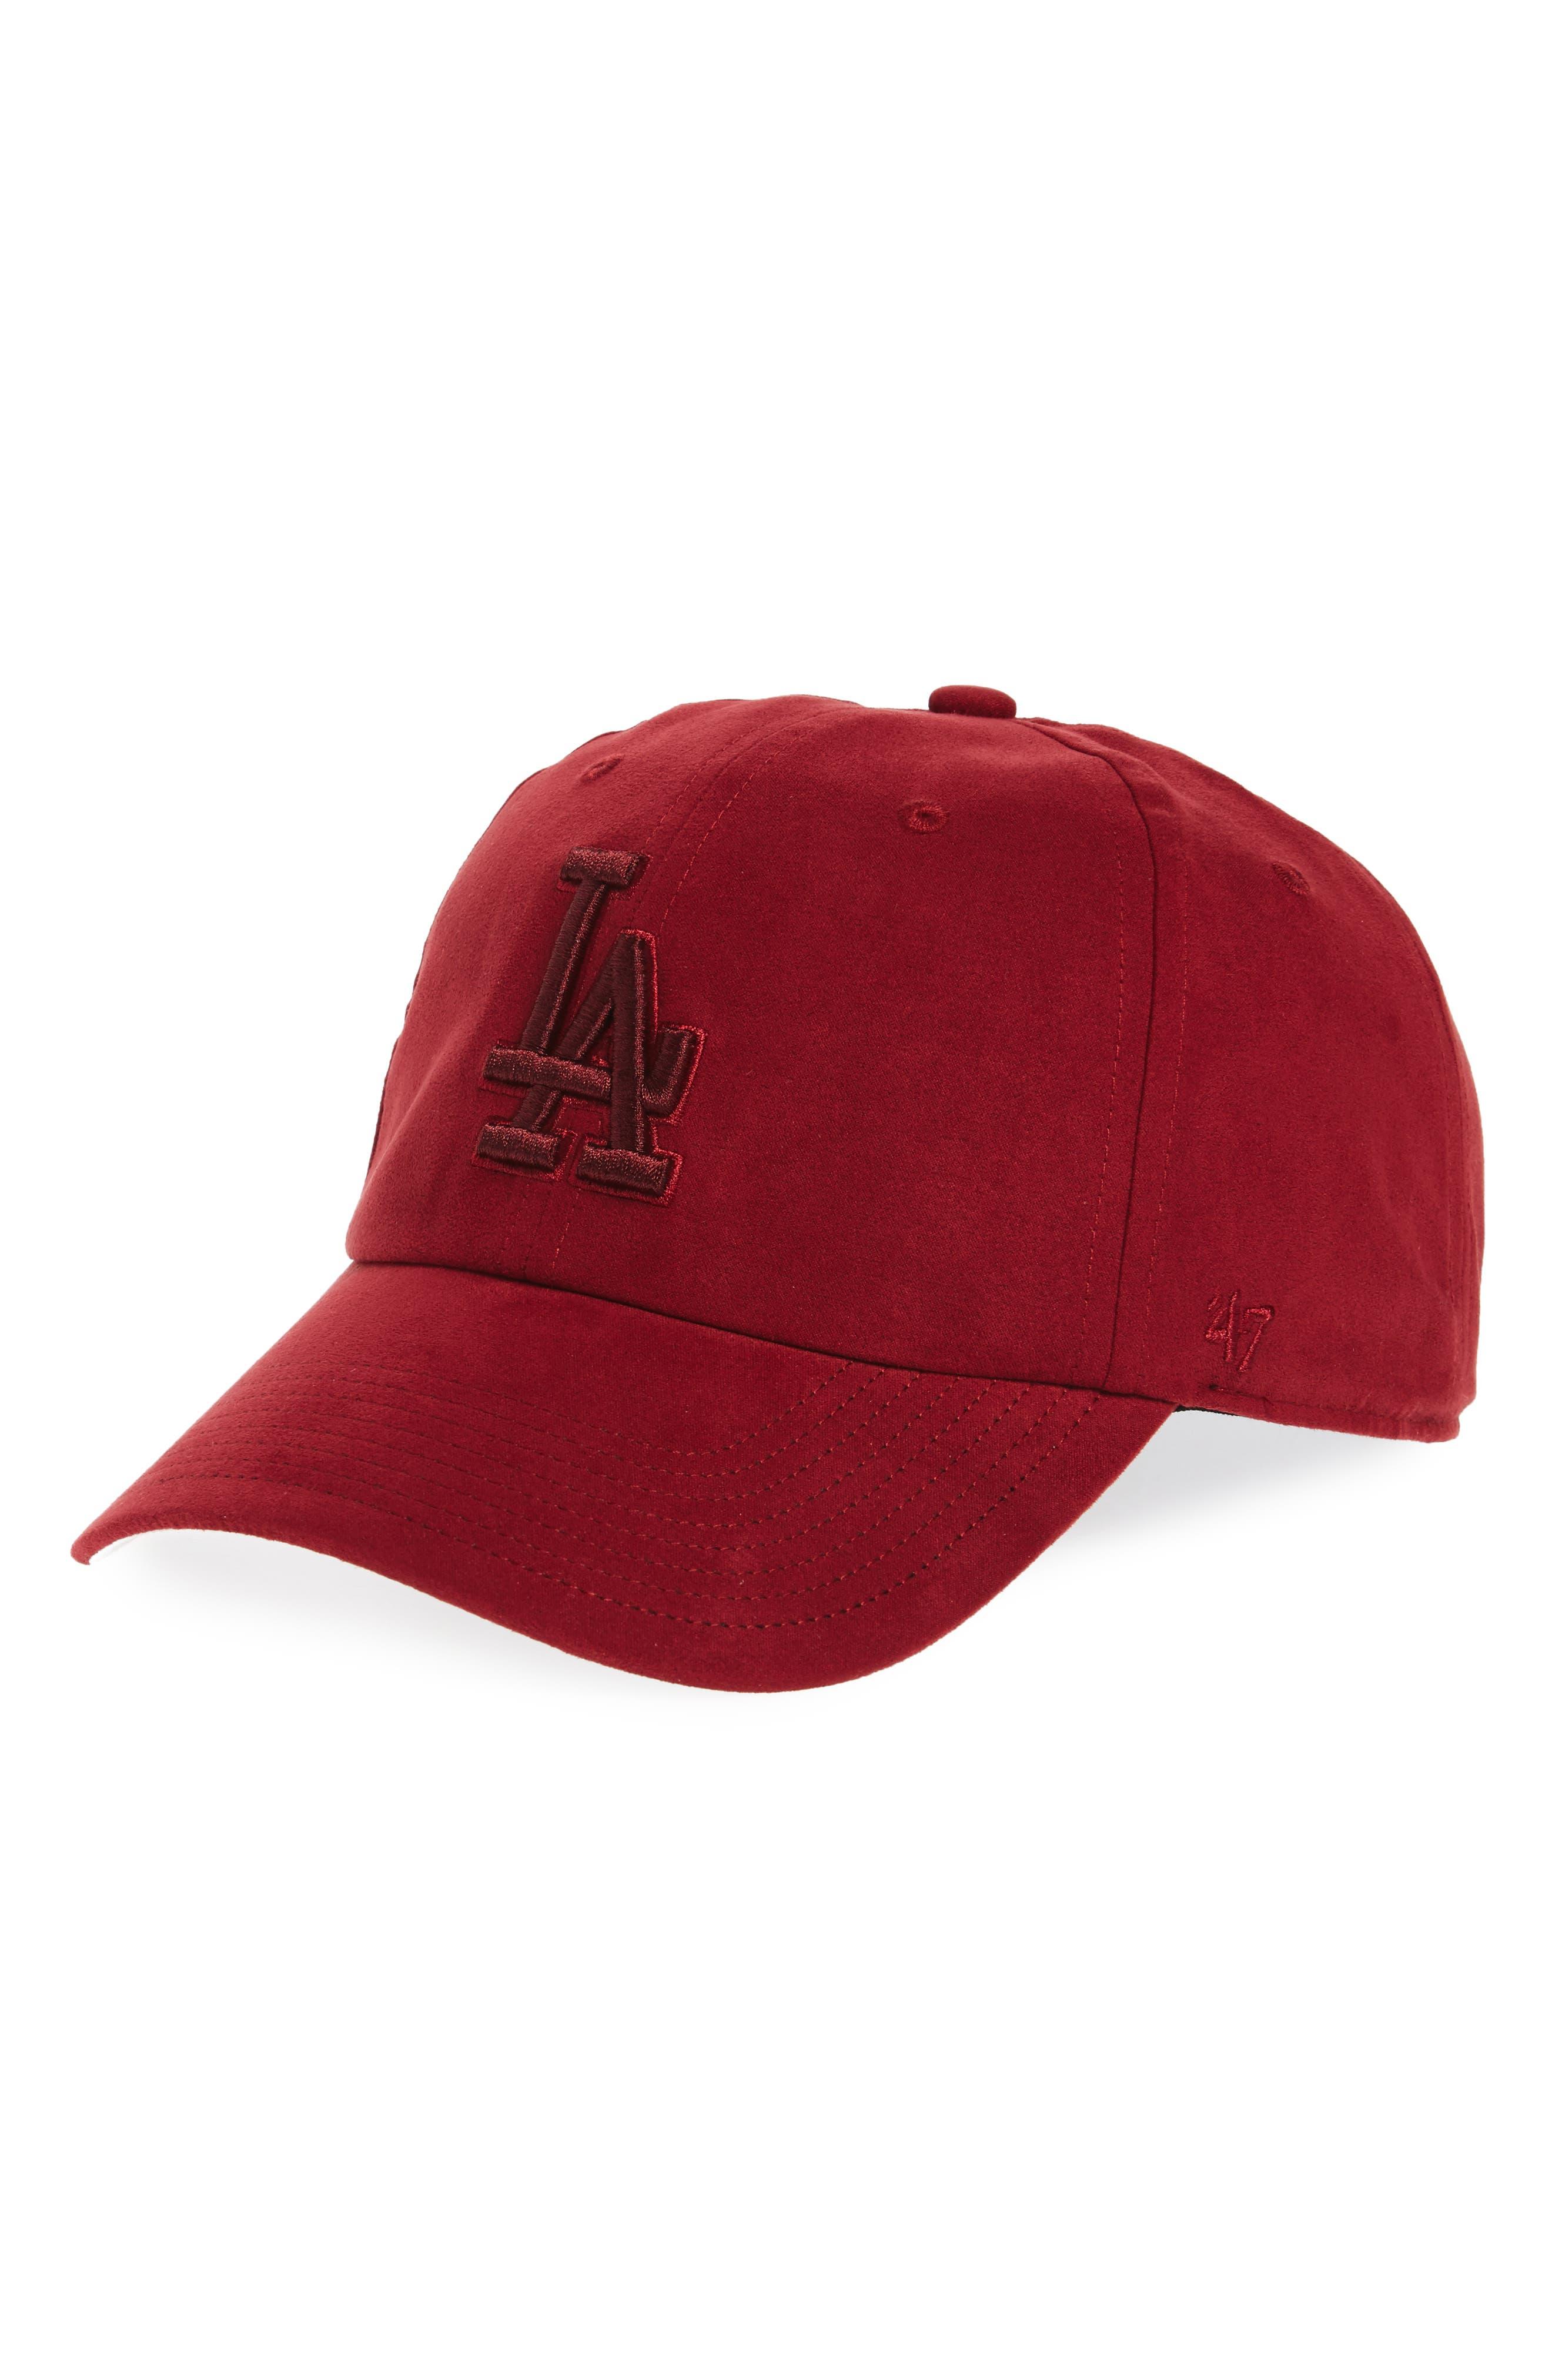 Alternate Image 1 Selected - '47 Brand Los Angeles Dodgers Baseball Cap